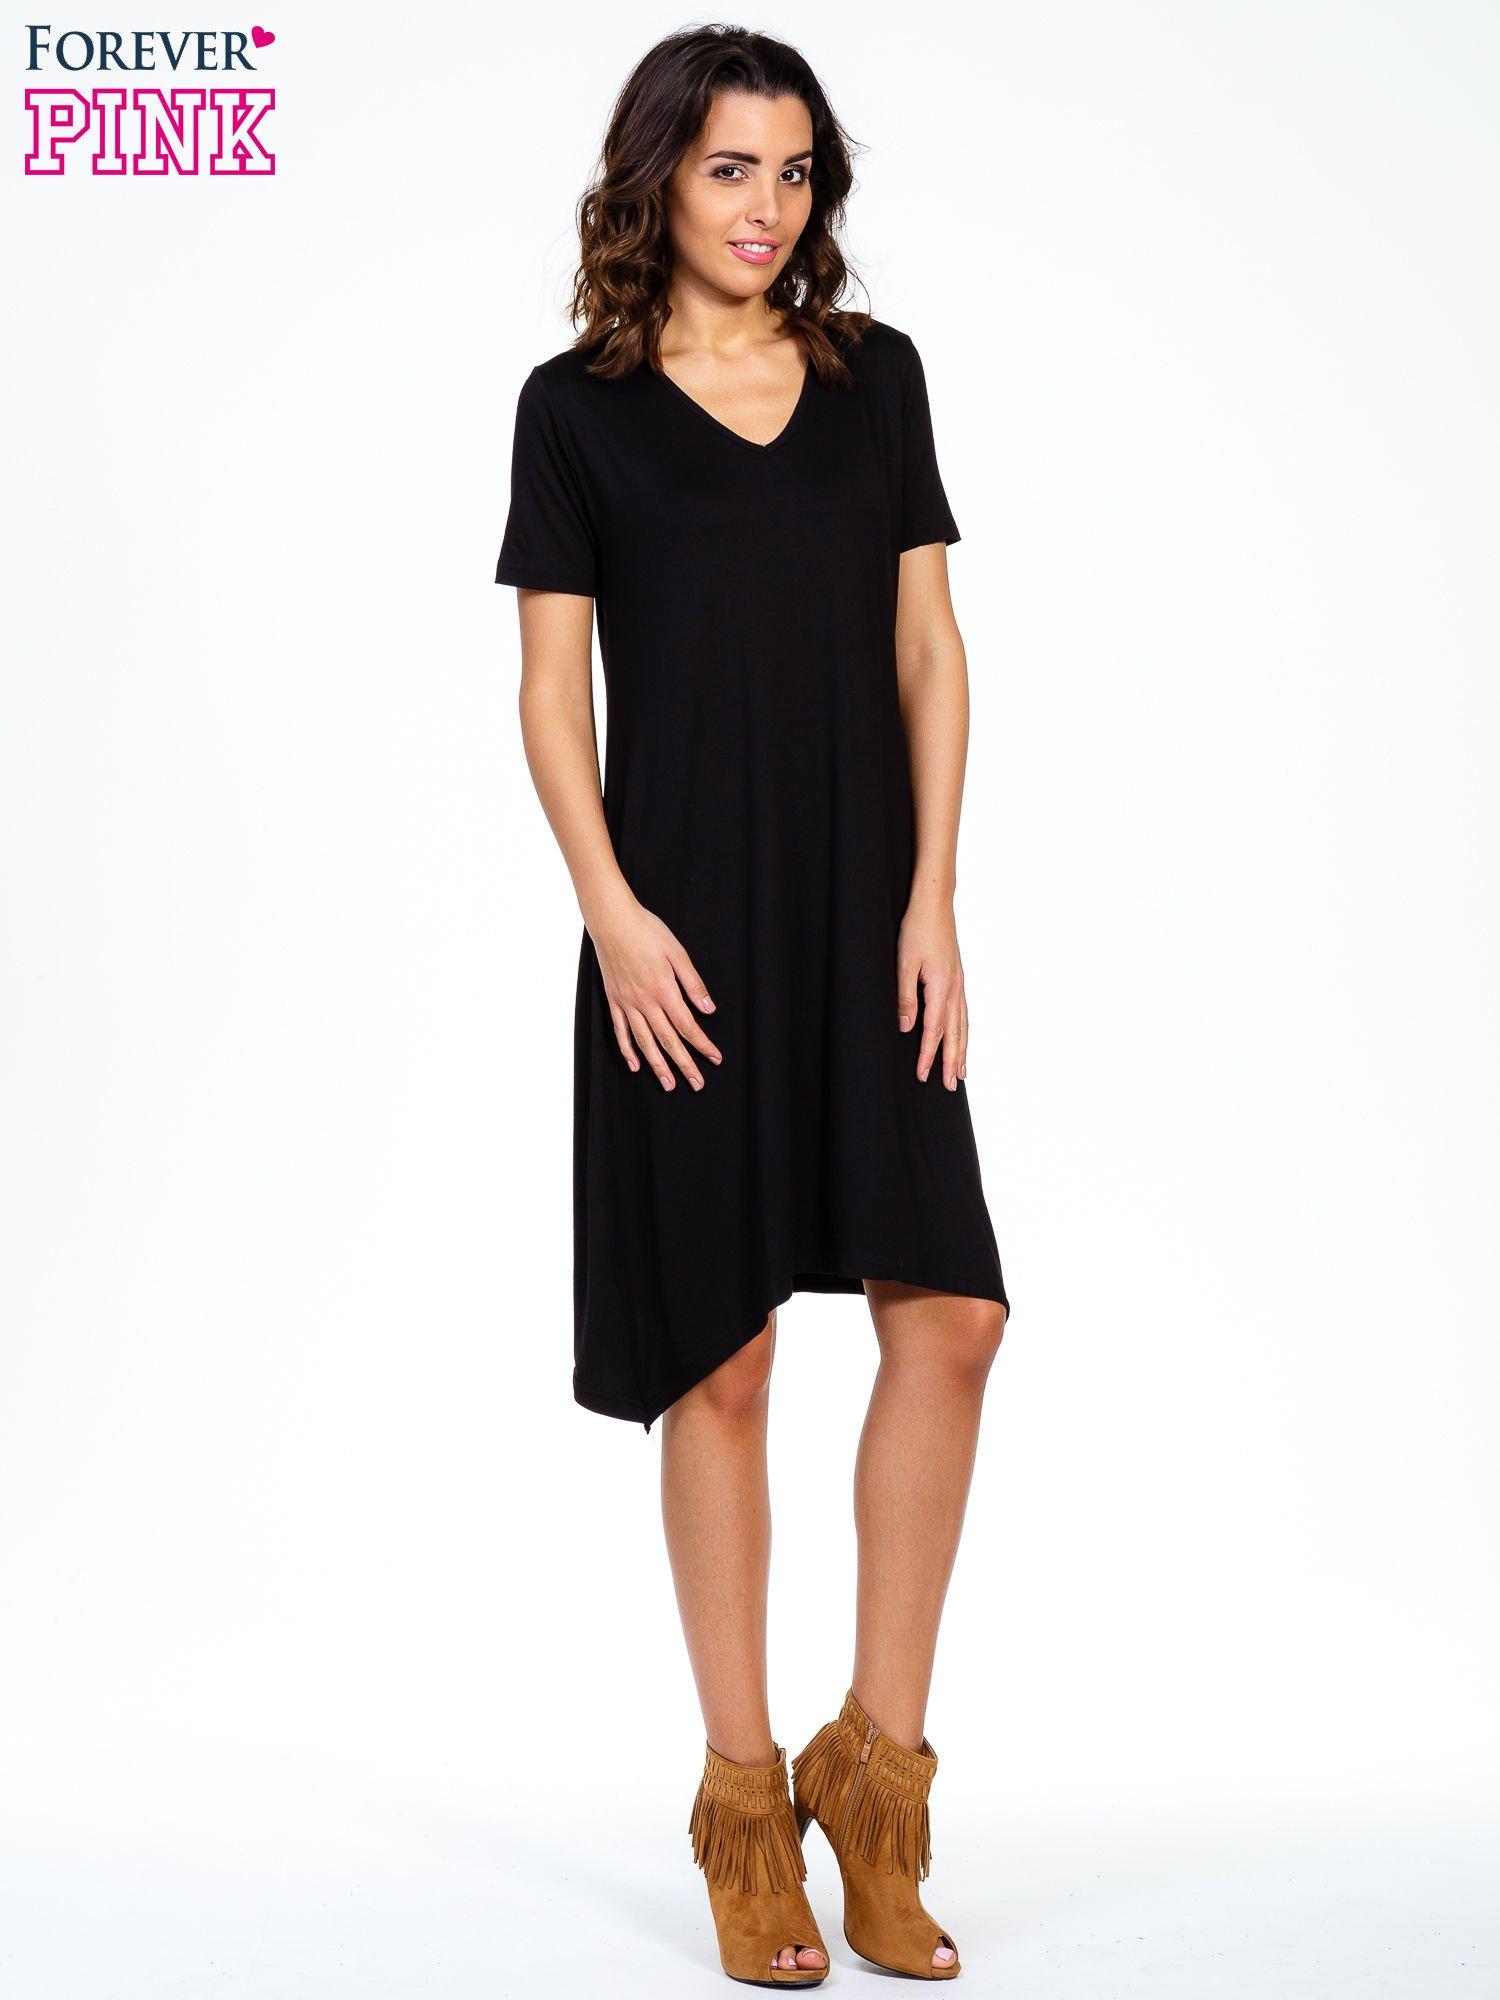 Czarna luźna sukienka z asymetrycznym dołem                                  zdj.                                  1